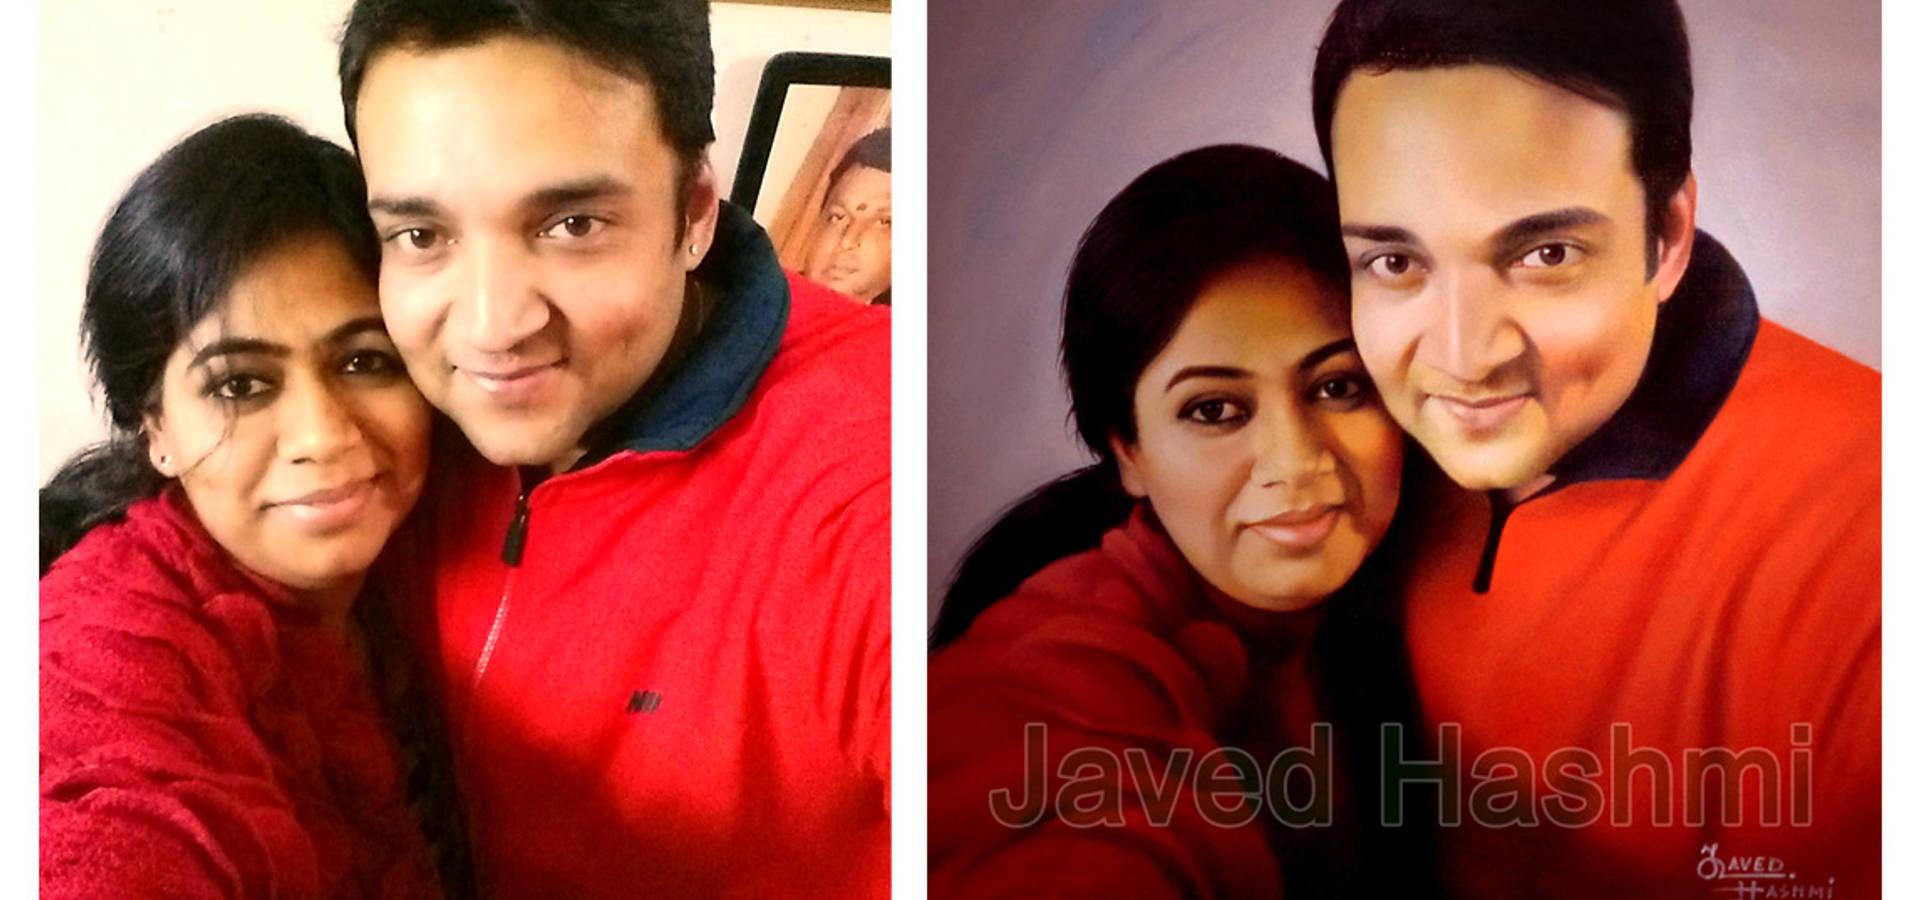 Javed Hashmi Paintings